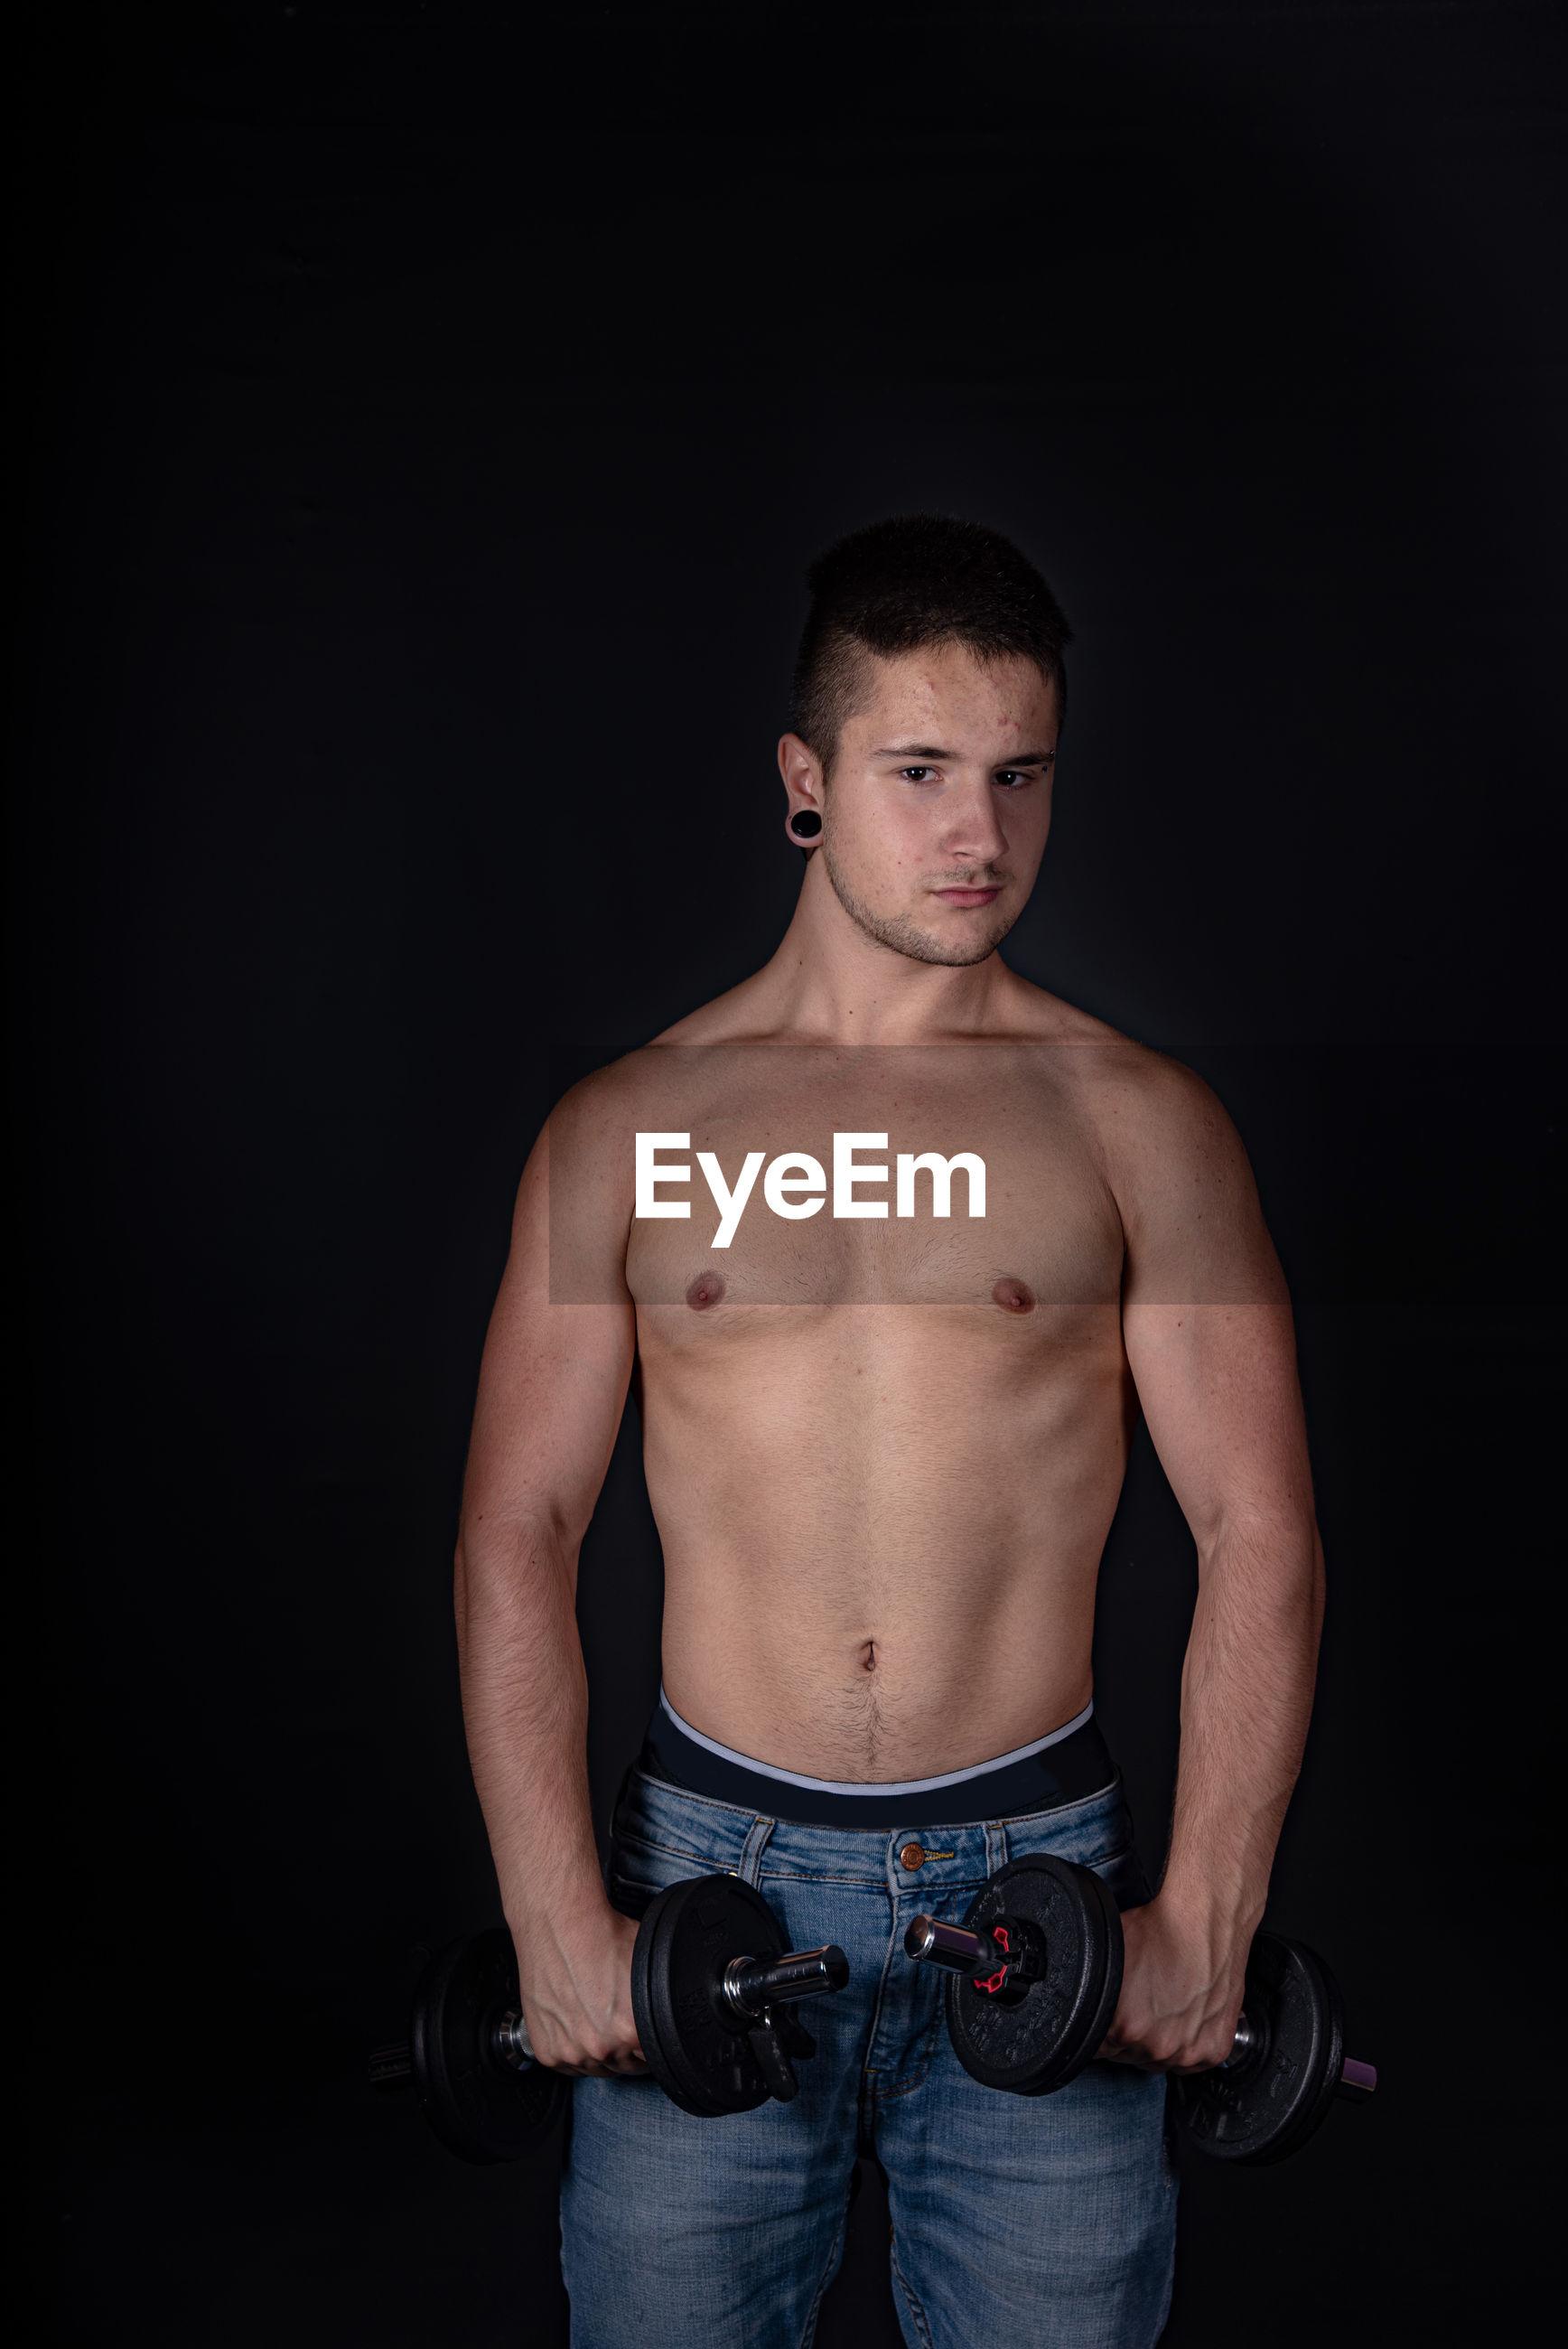 Portrait of shirtless man lifting dumbbells against black background